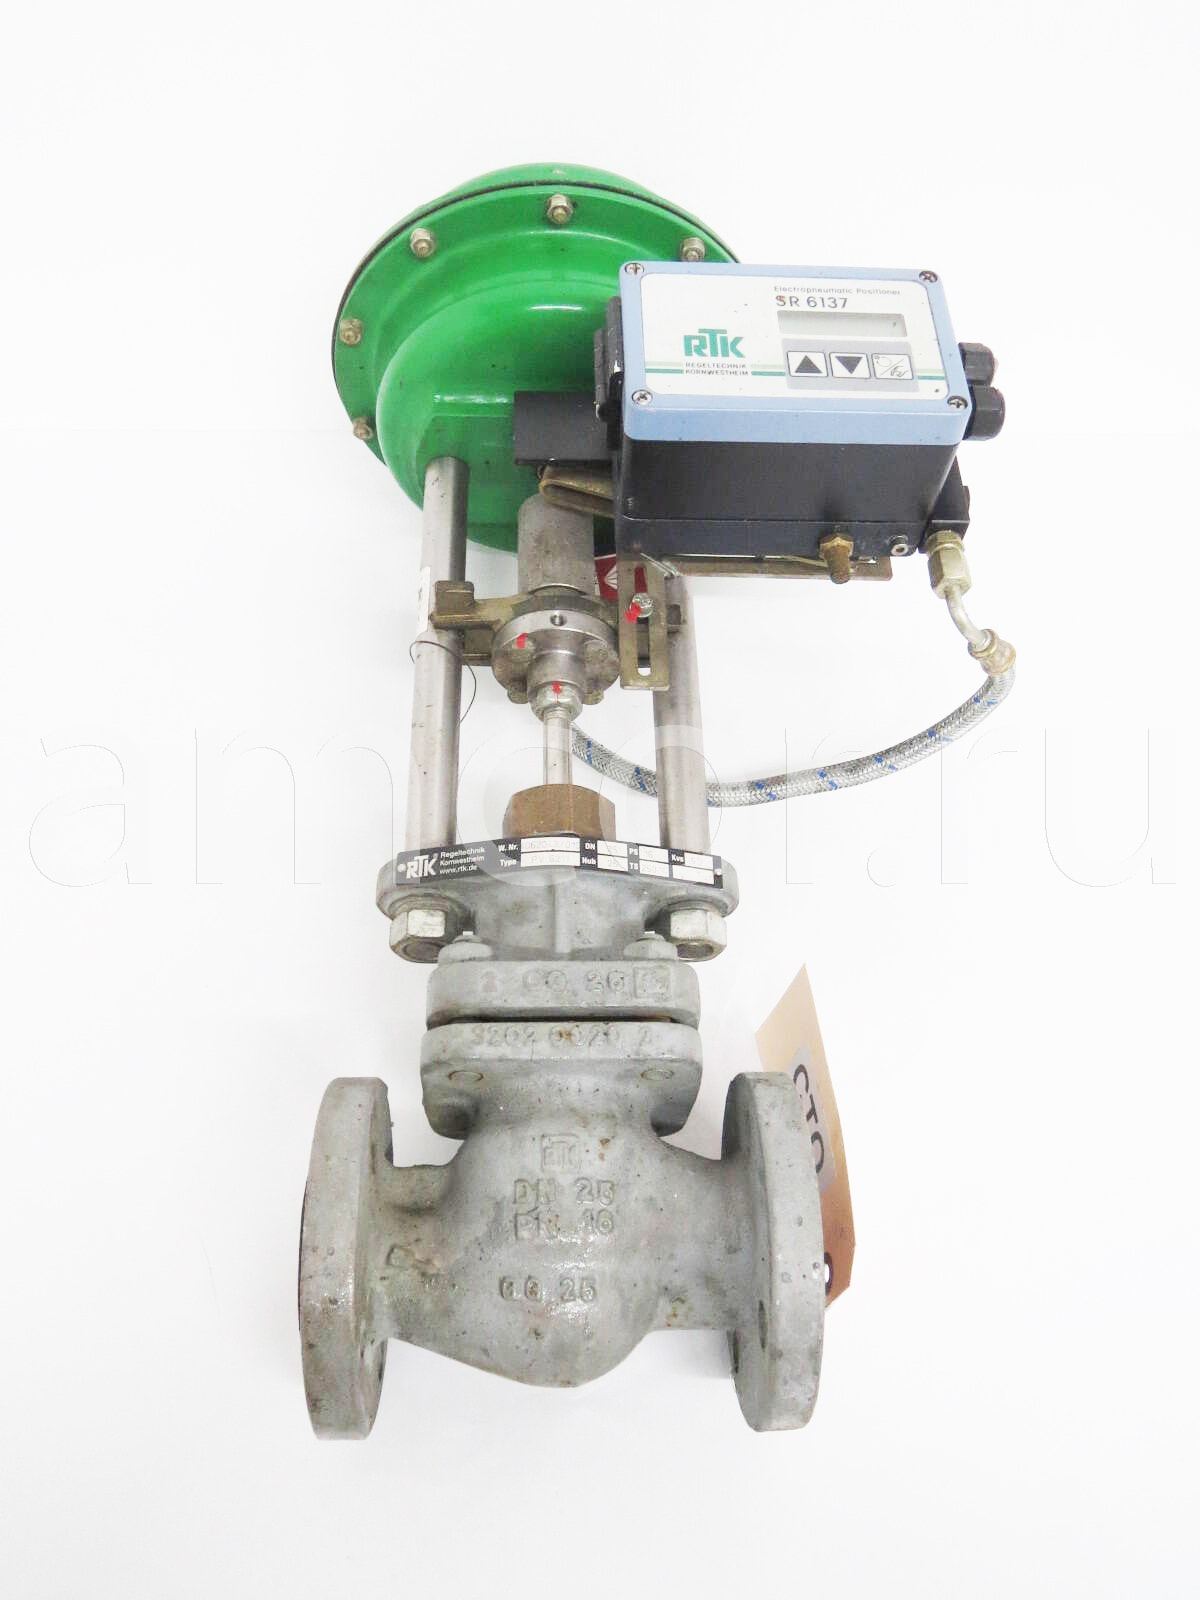 PV 6211 - RTK клапаны, регуляторы, датчики